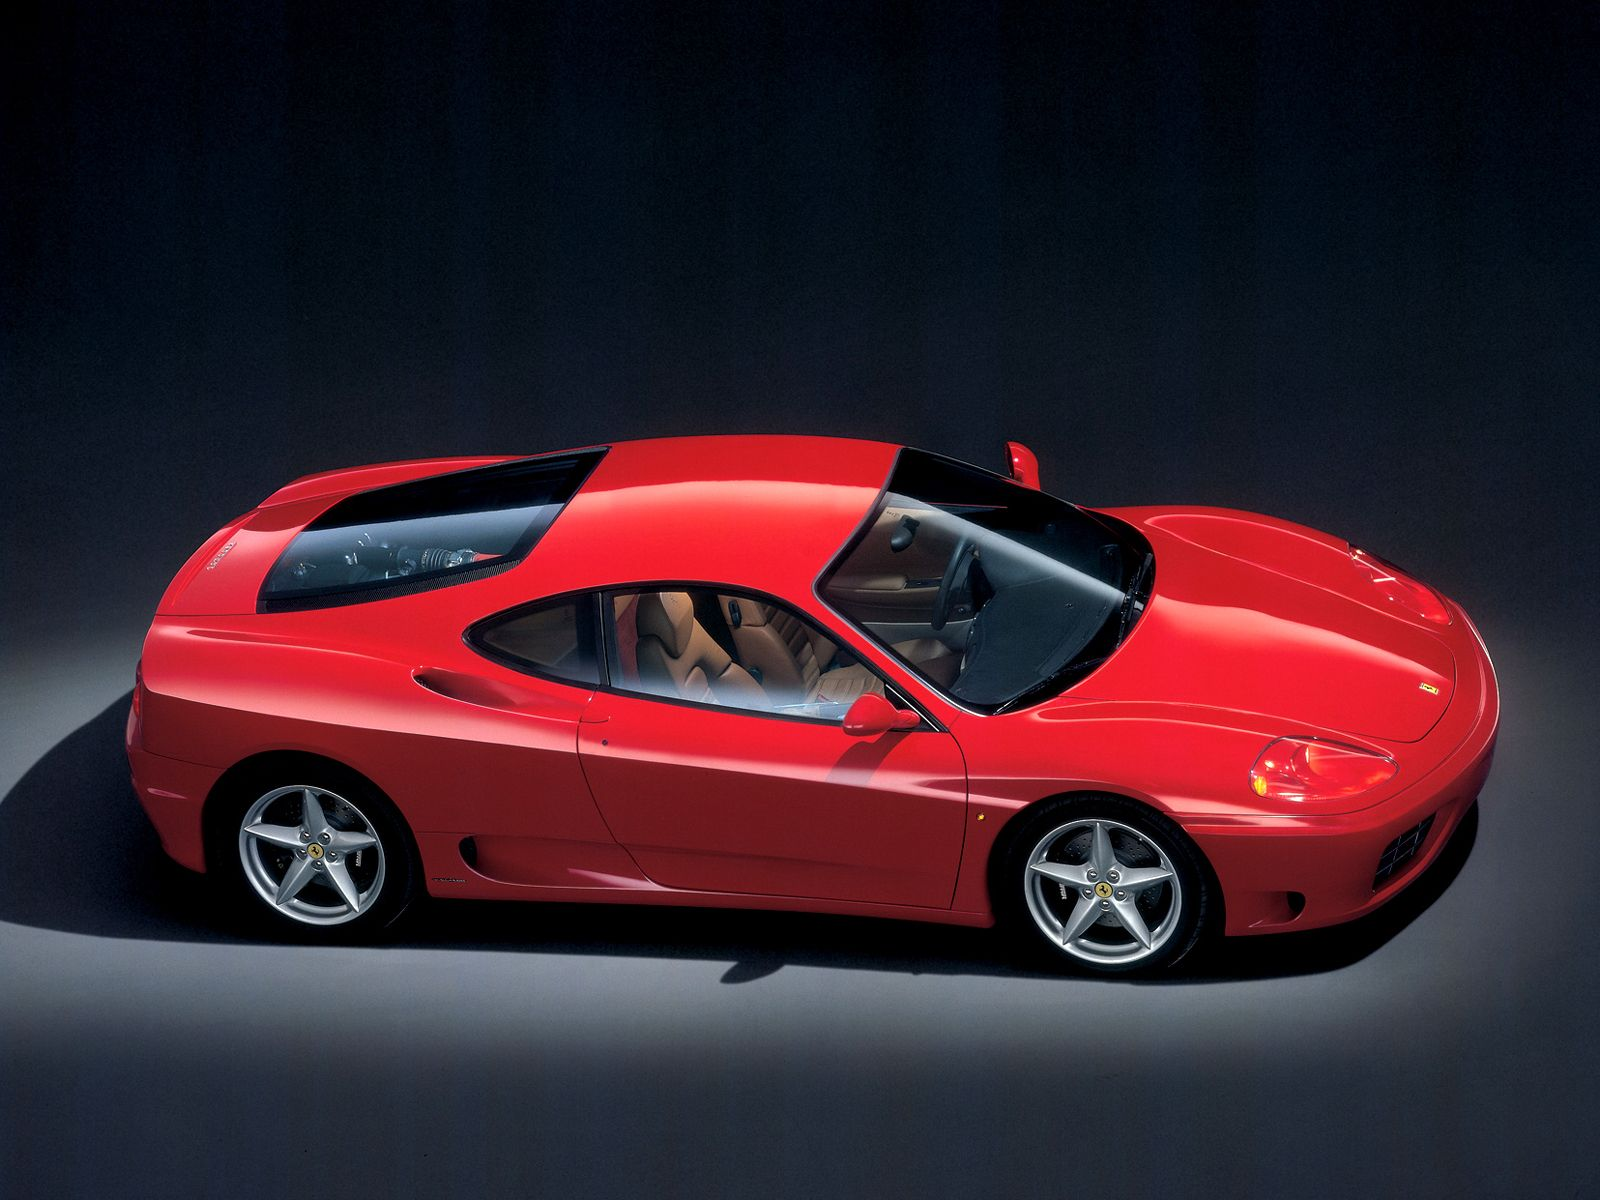 Red Ferrari 360 Modena Wallpaper 360 ferrari wallpaper